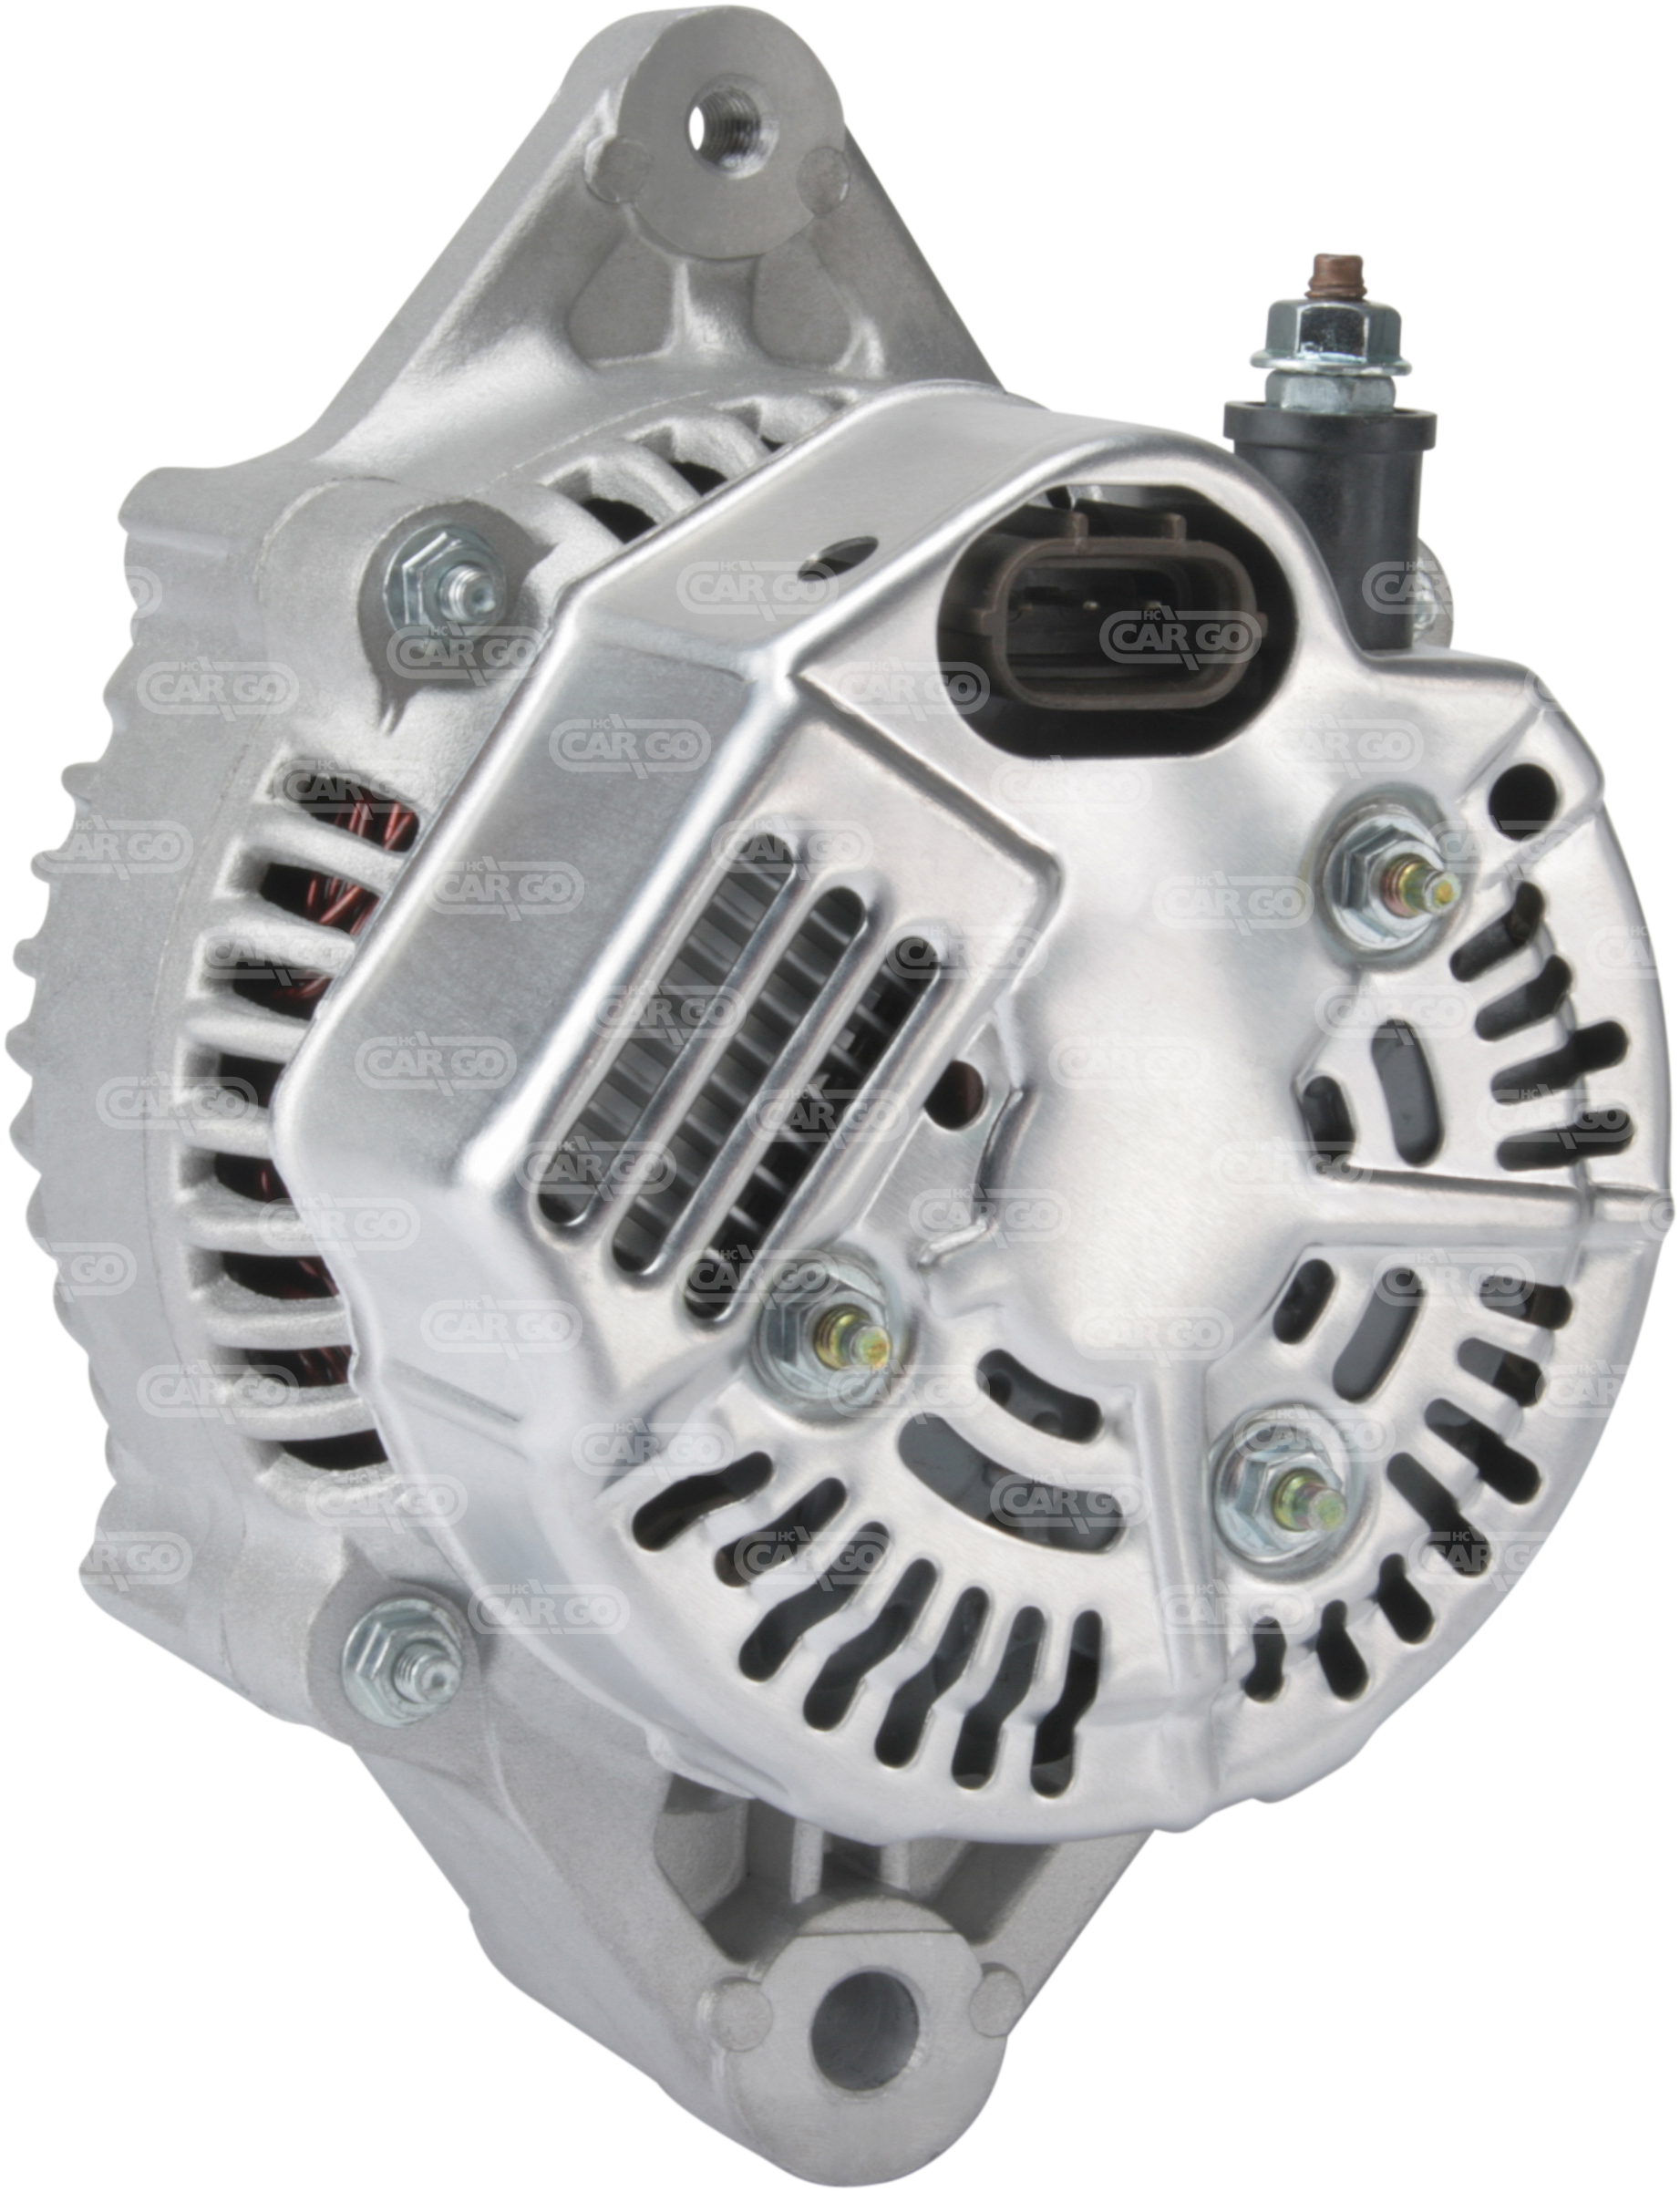 Alternateur 770 Voltage14 Amp80